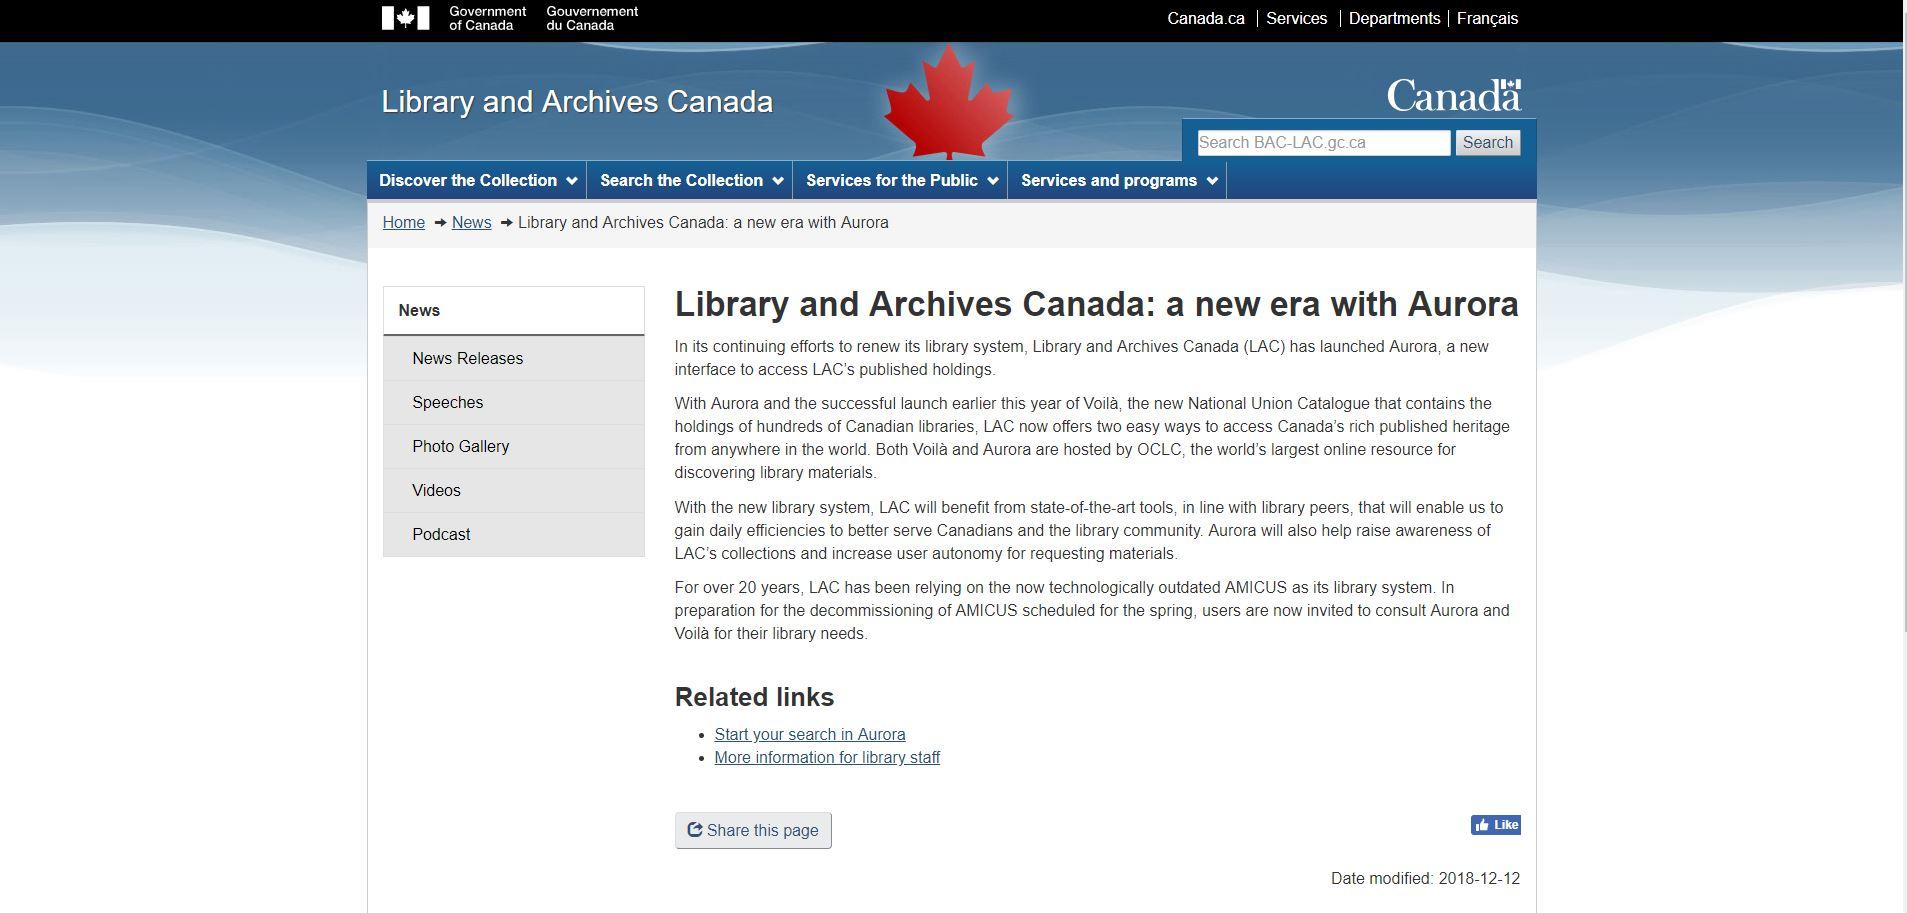 Aurora圖書館館藏檢索系統